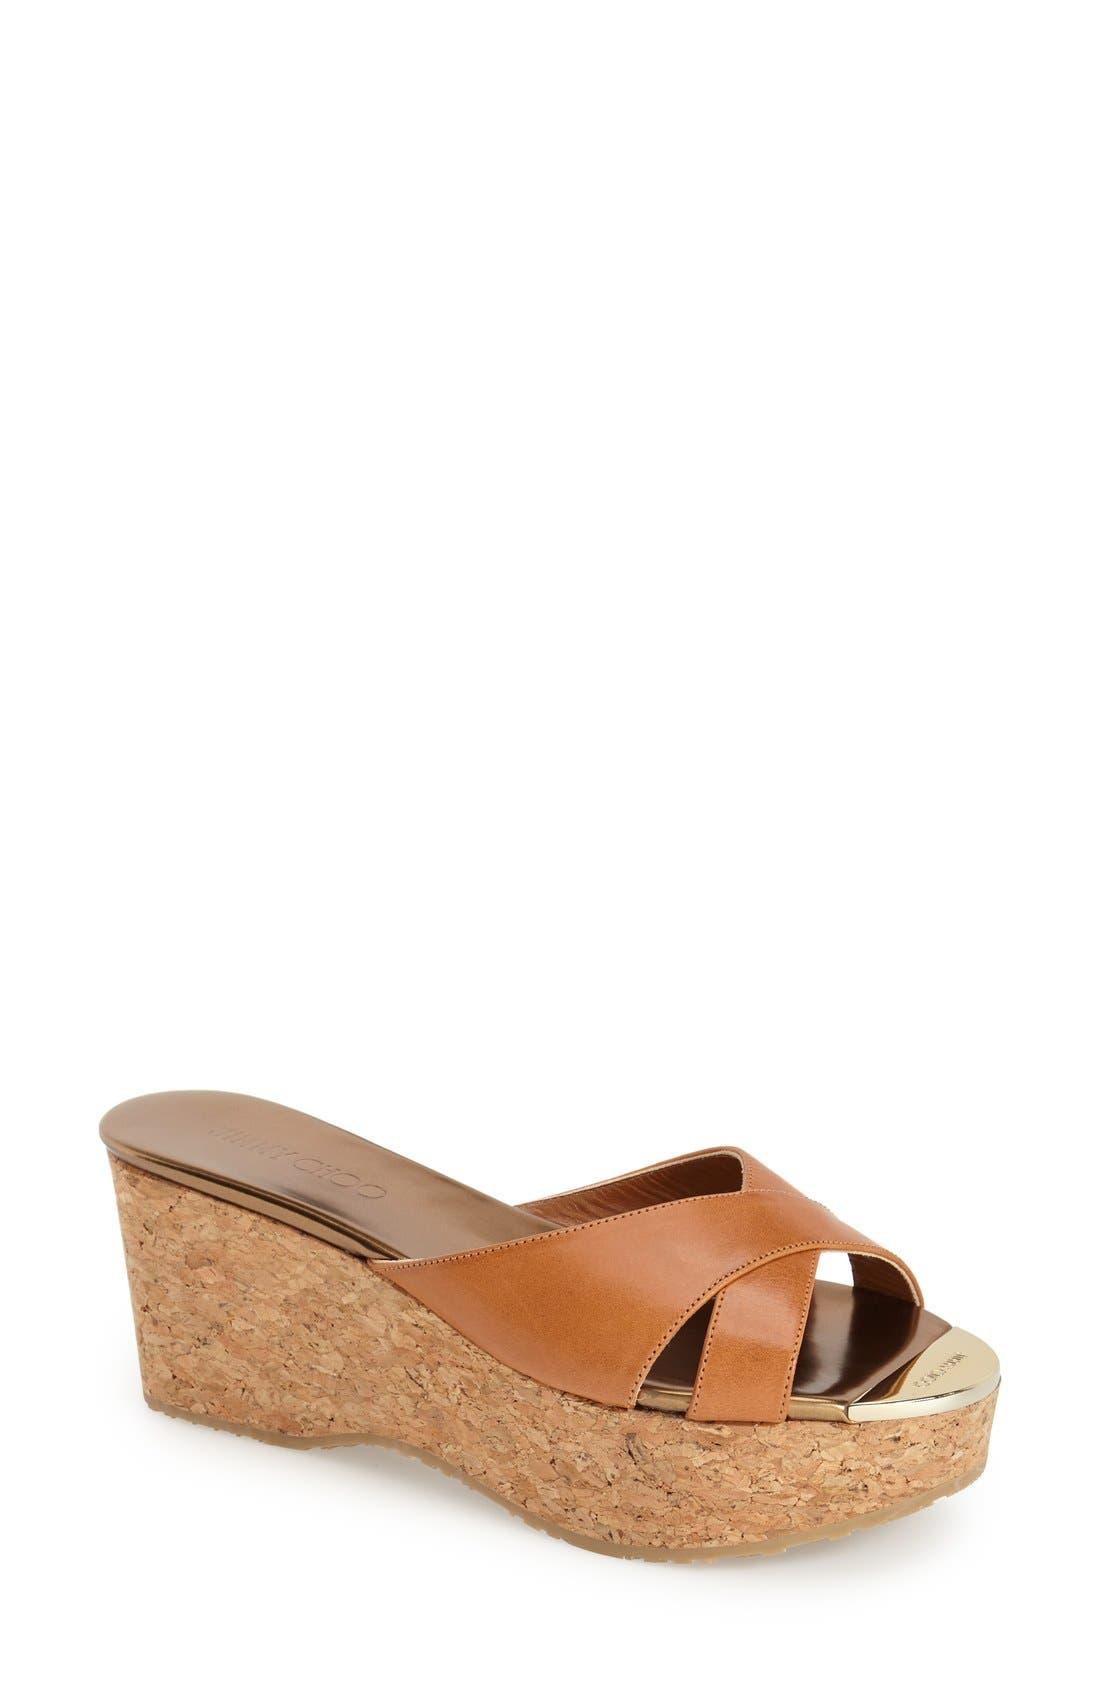 Main Image - Jimmy Choo 'Prima' Cork Platform Sandal